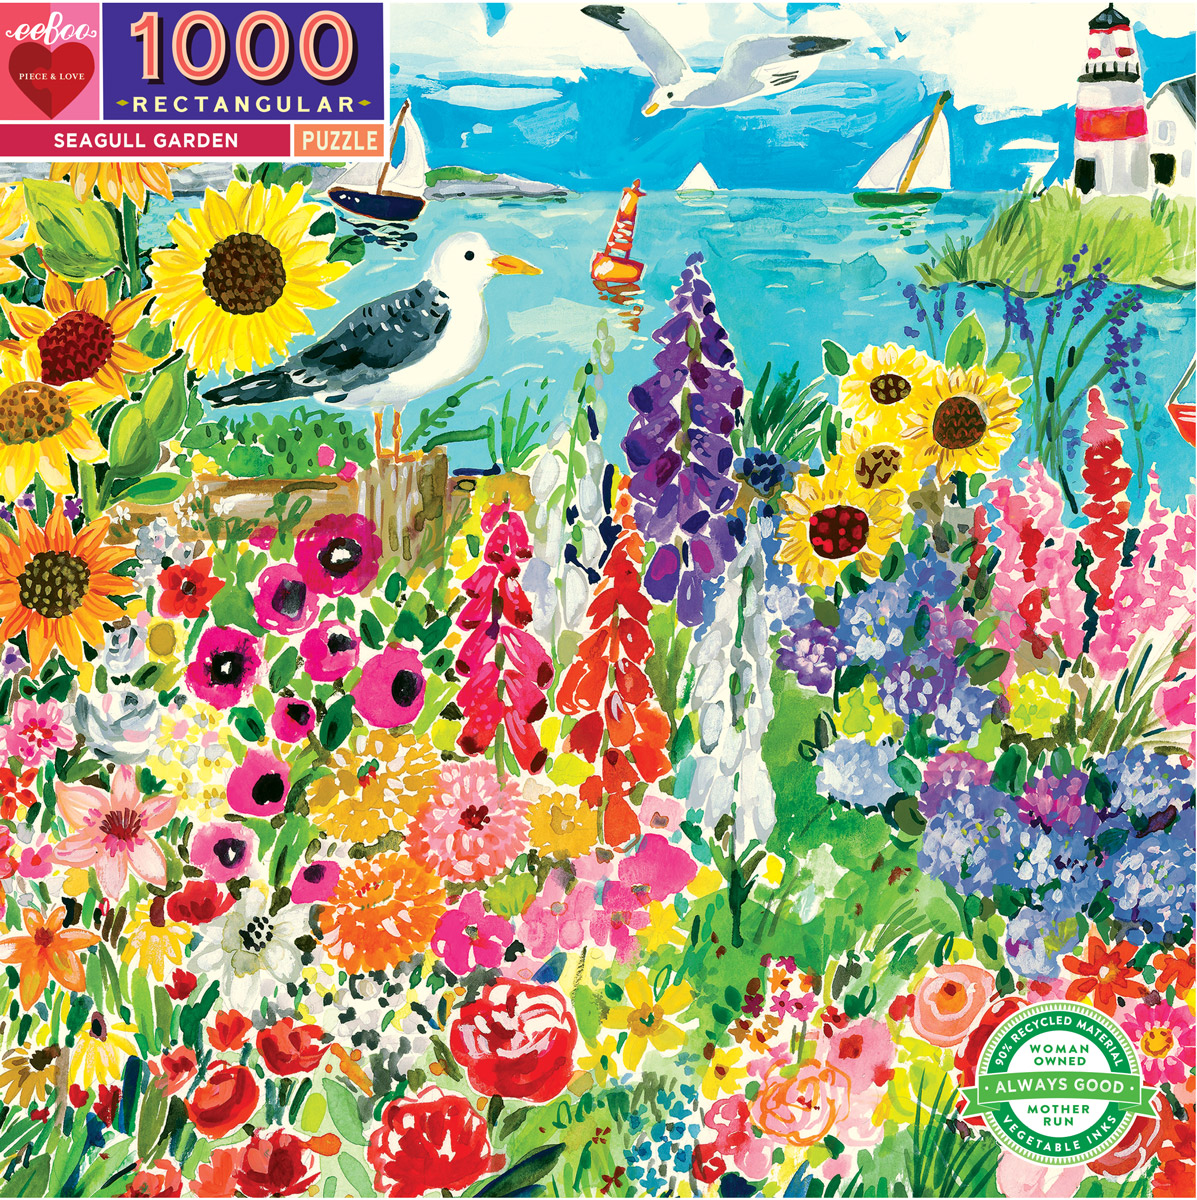 Seagull Garden Beach Jigsaw Puzzle